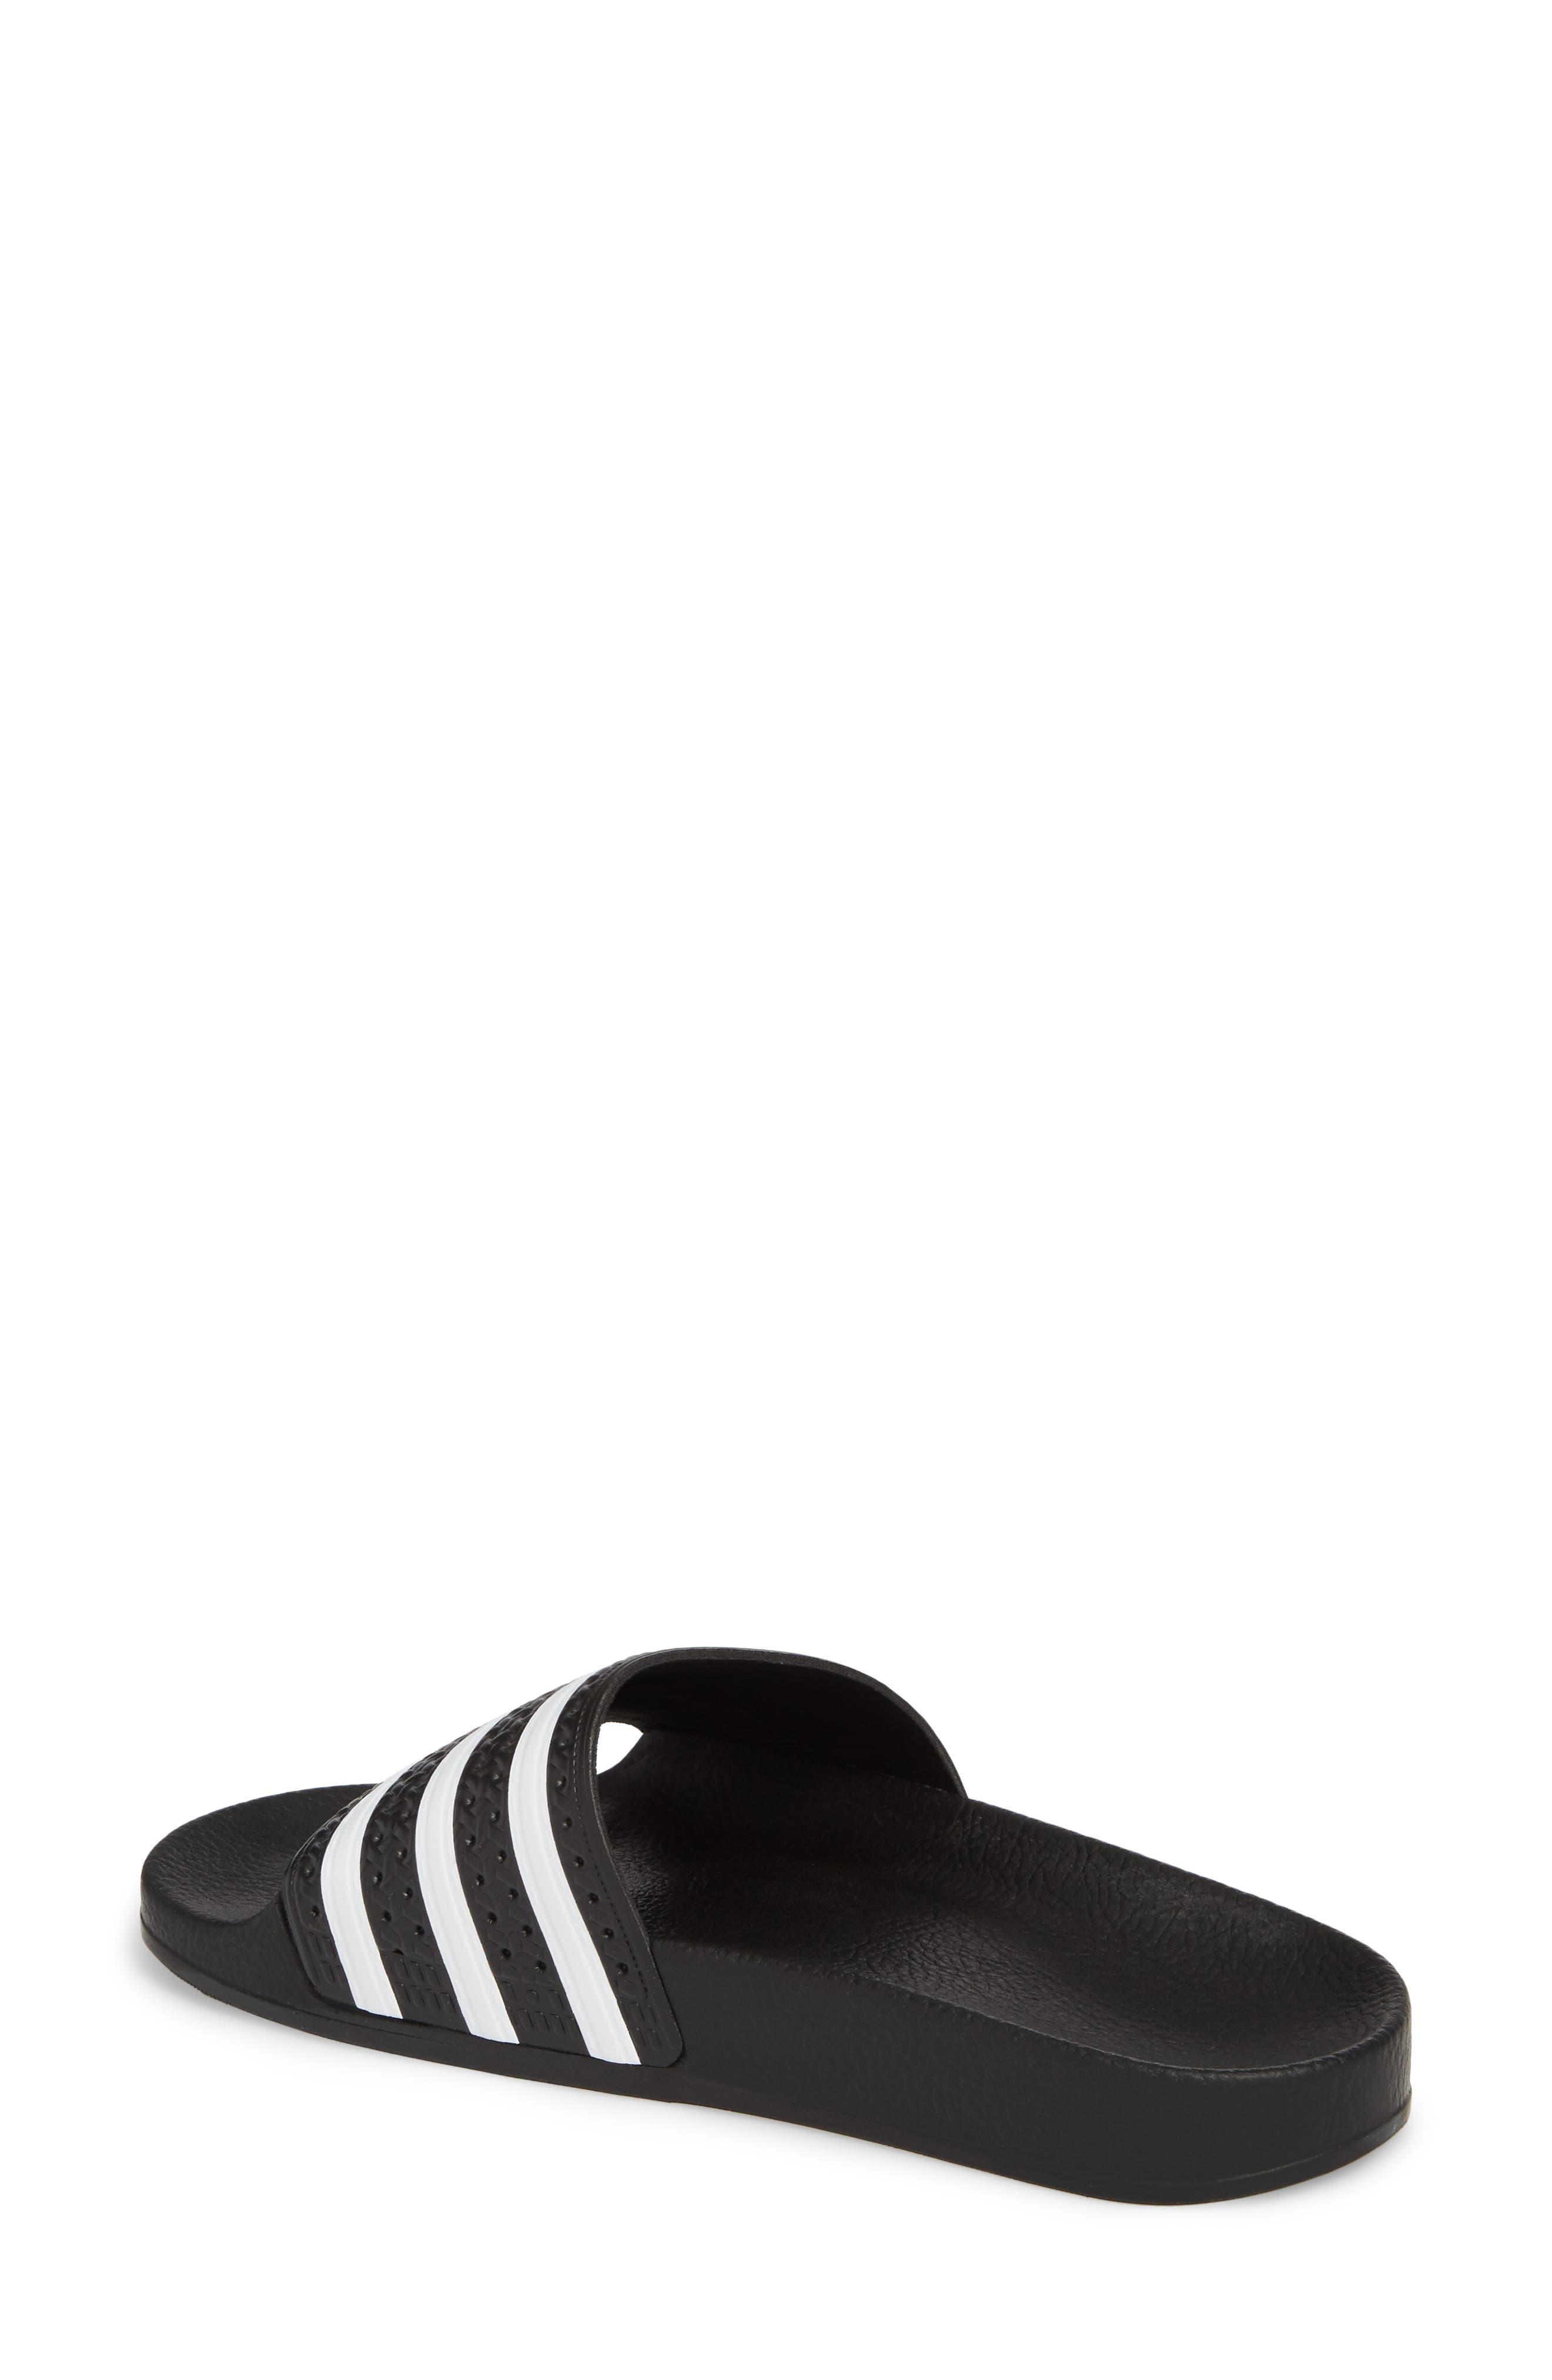 ADIDAS,                             'Adilette' Slide Sandal,                             Alternate thumbnail 2, color,                             CORE BLACK/ WHITE/ CORE BLACK